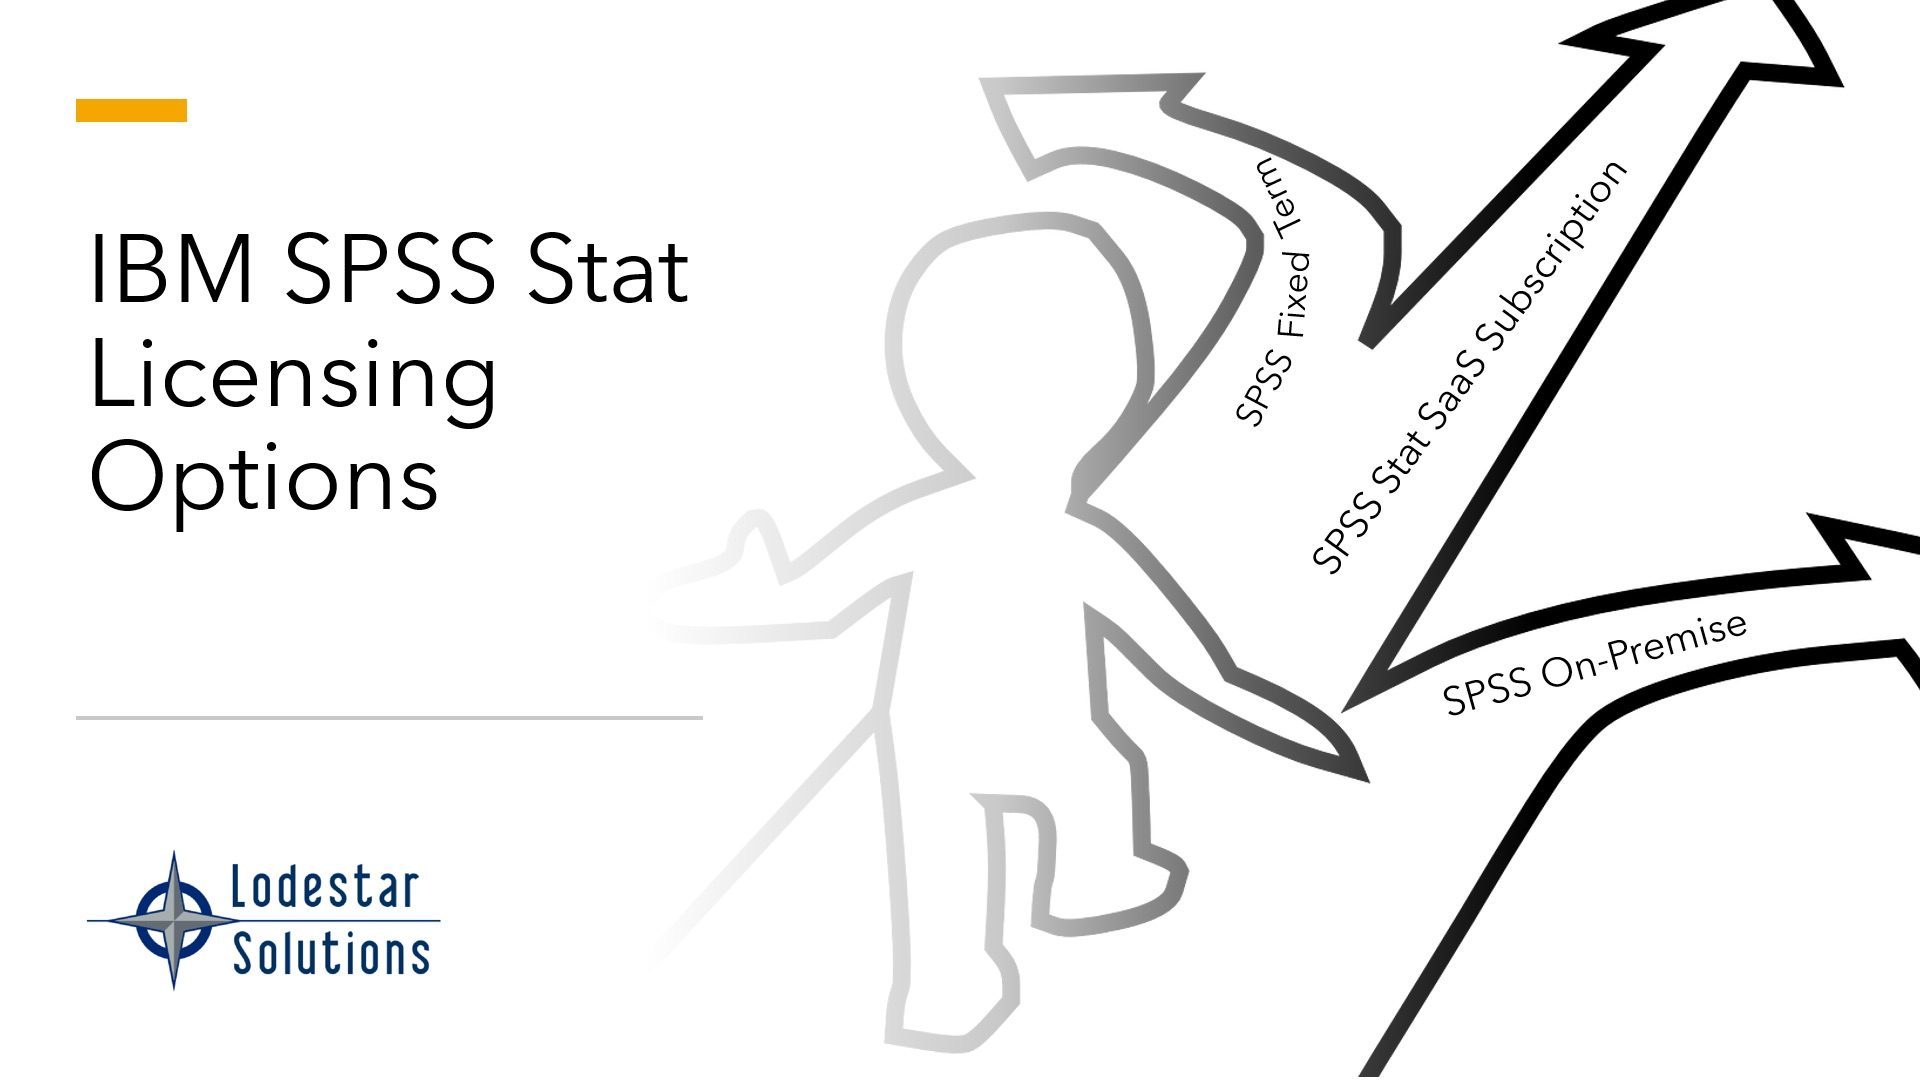 IBM SPSS Stat Options